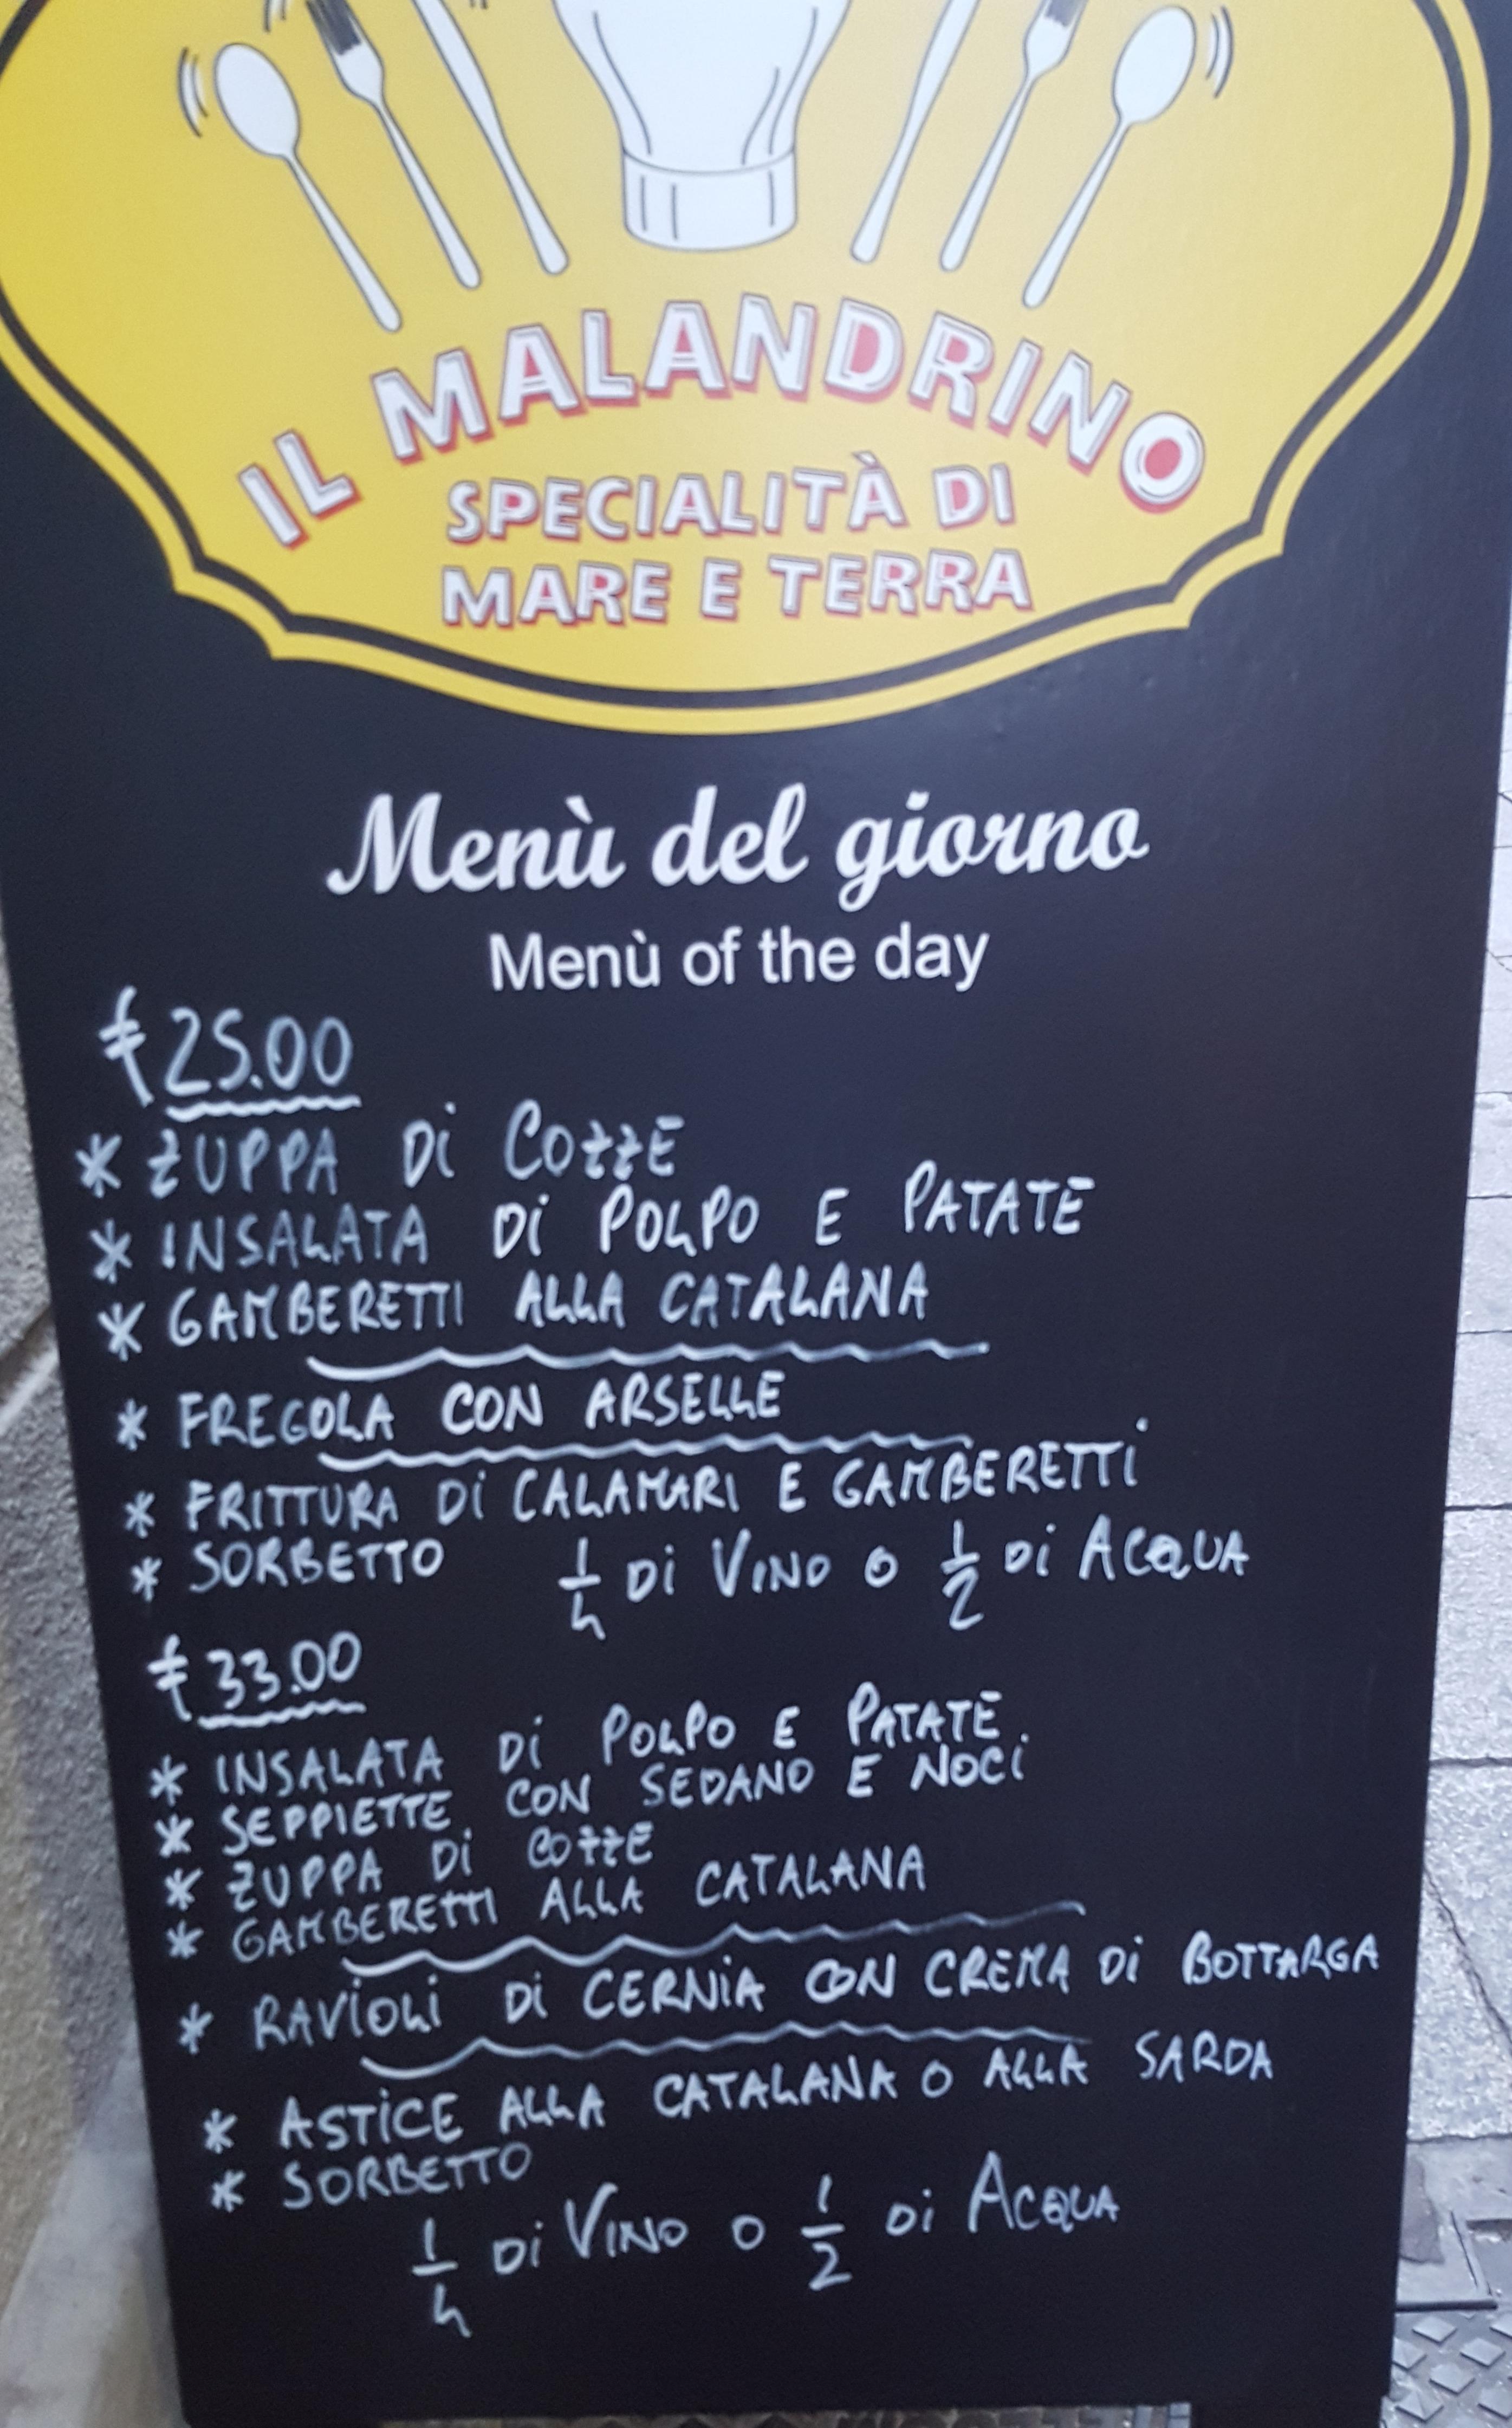 Malandrino menu